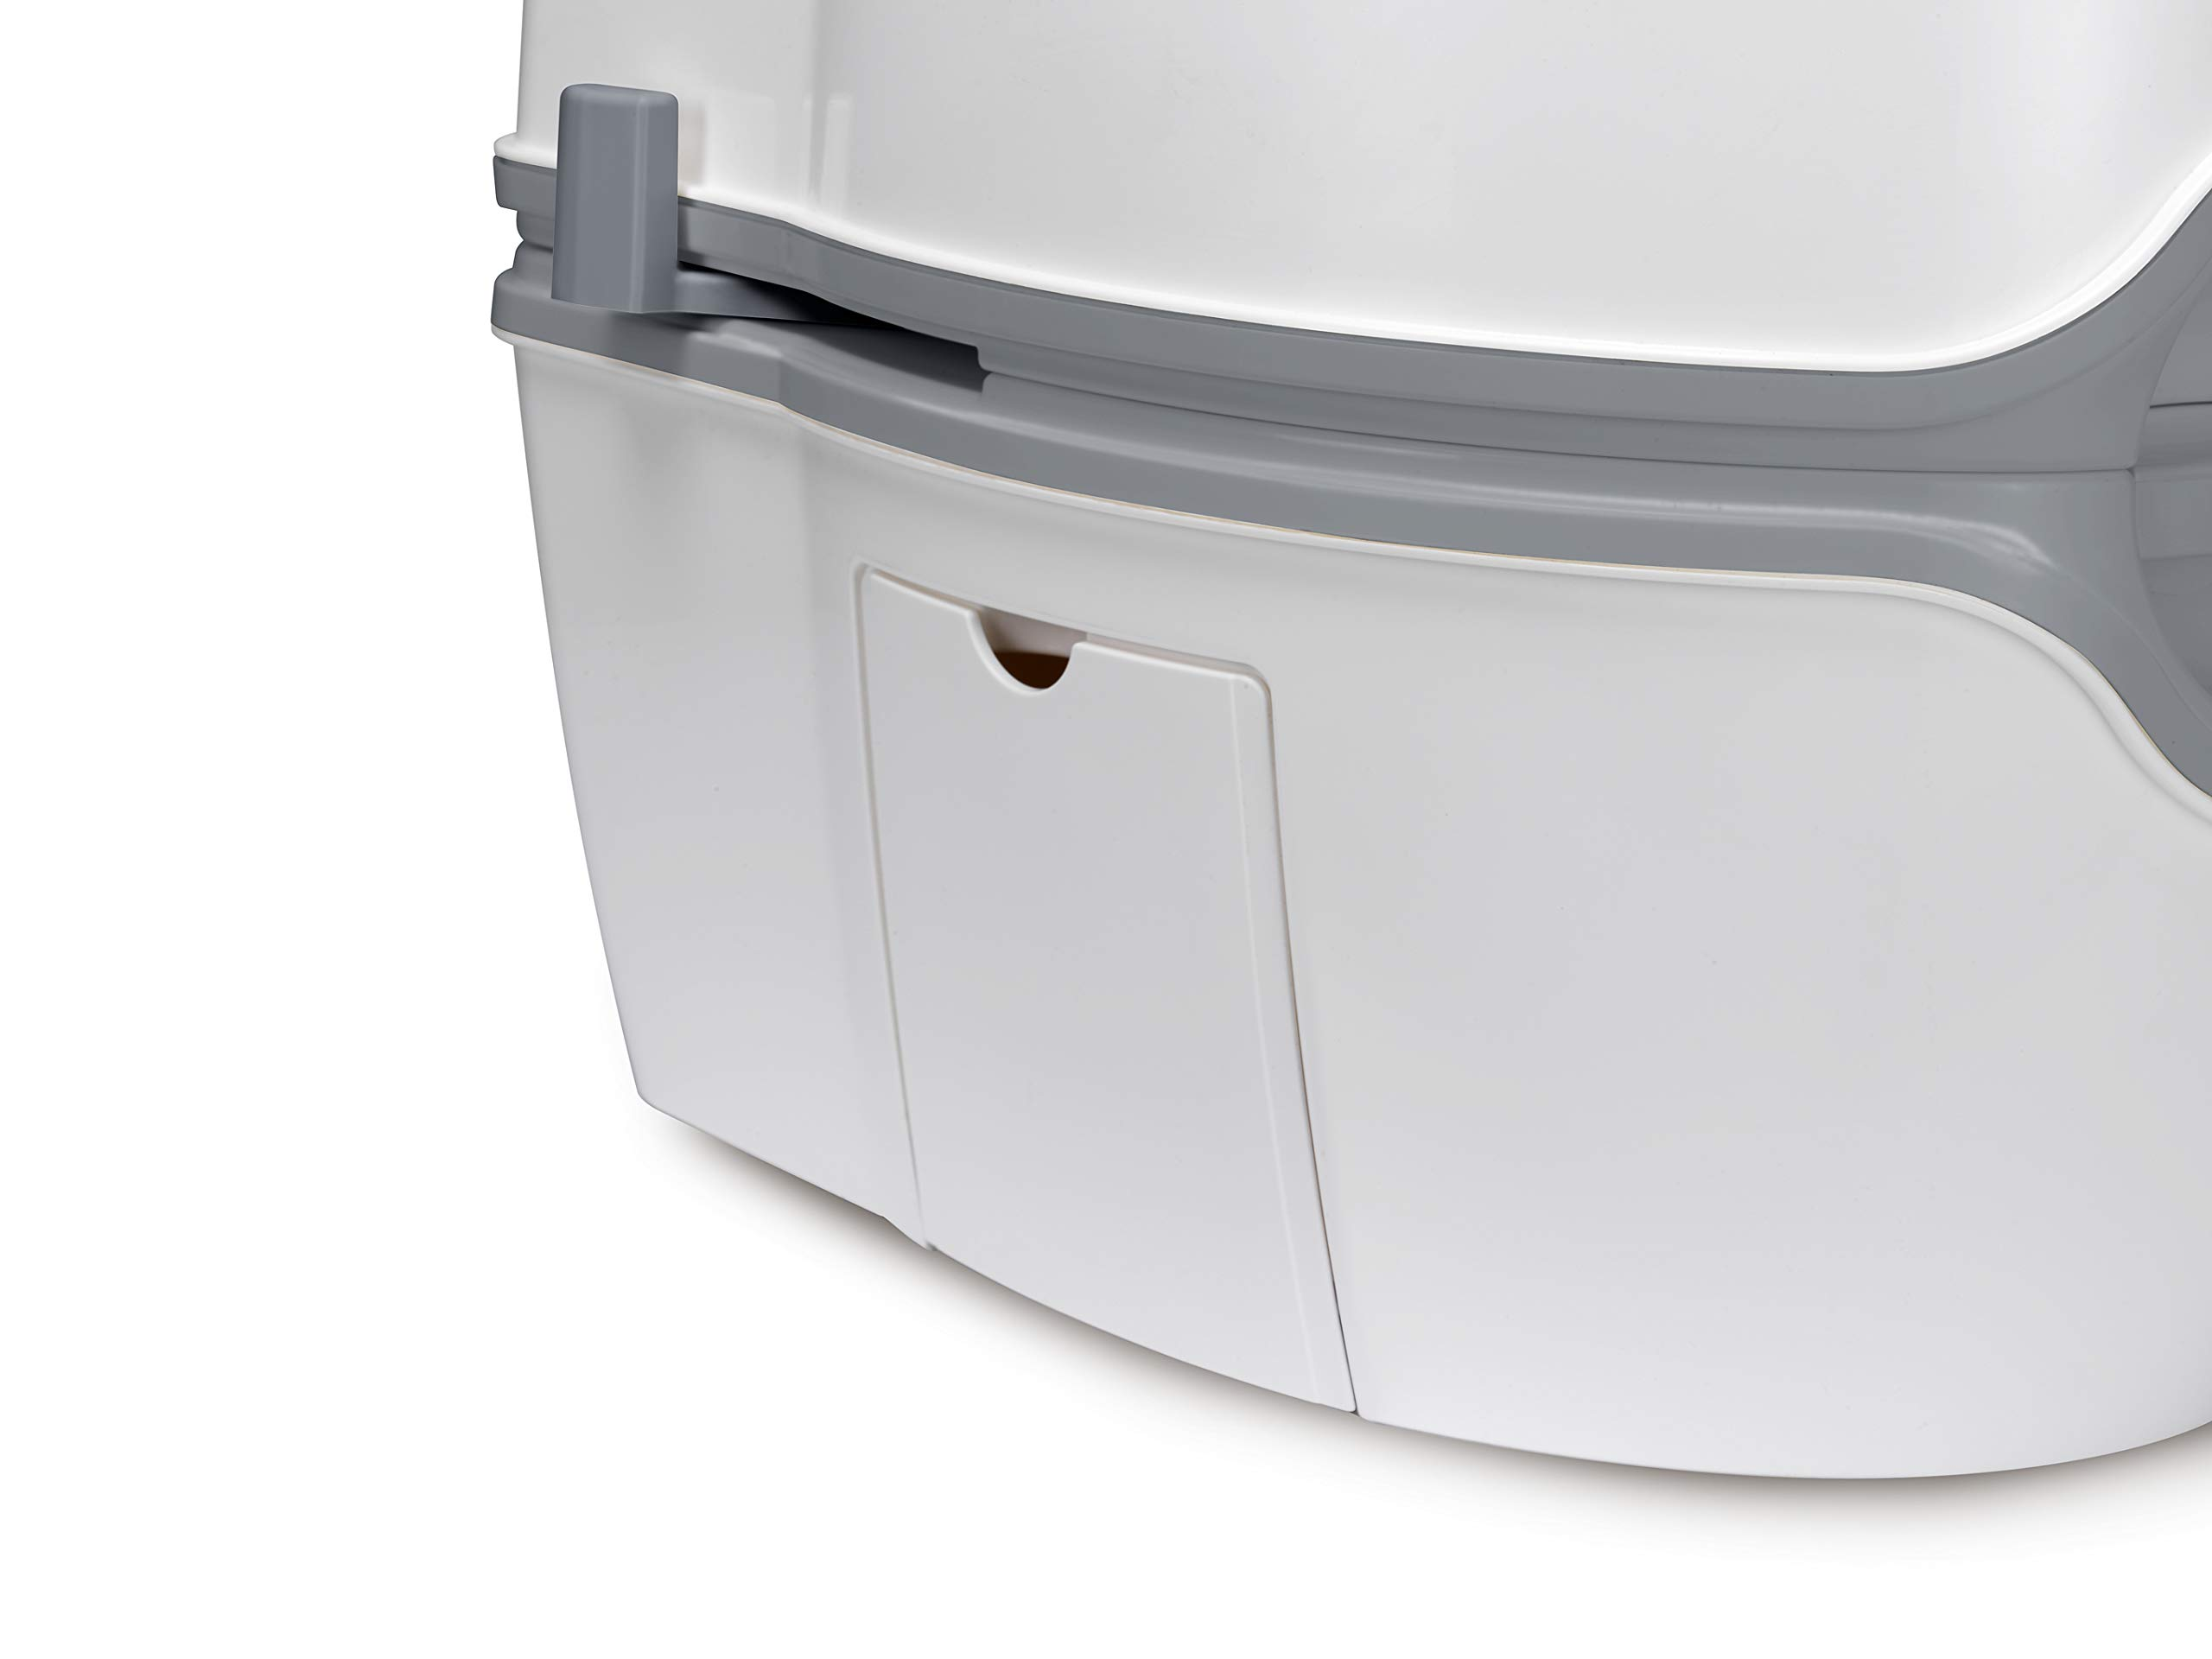 Thetford 92305 Porta Potti 565P Excellence Portable Toilet (Manual), 448 x 388 x 450 mm 7